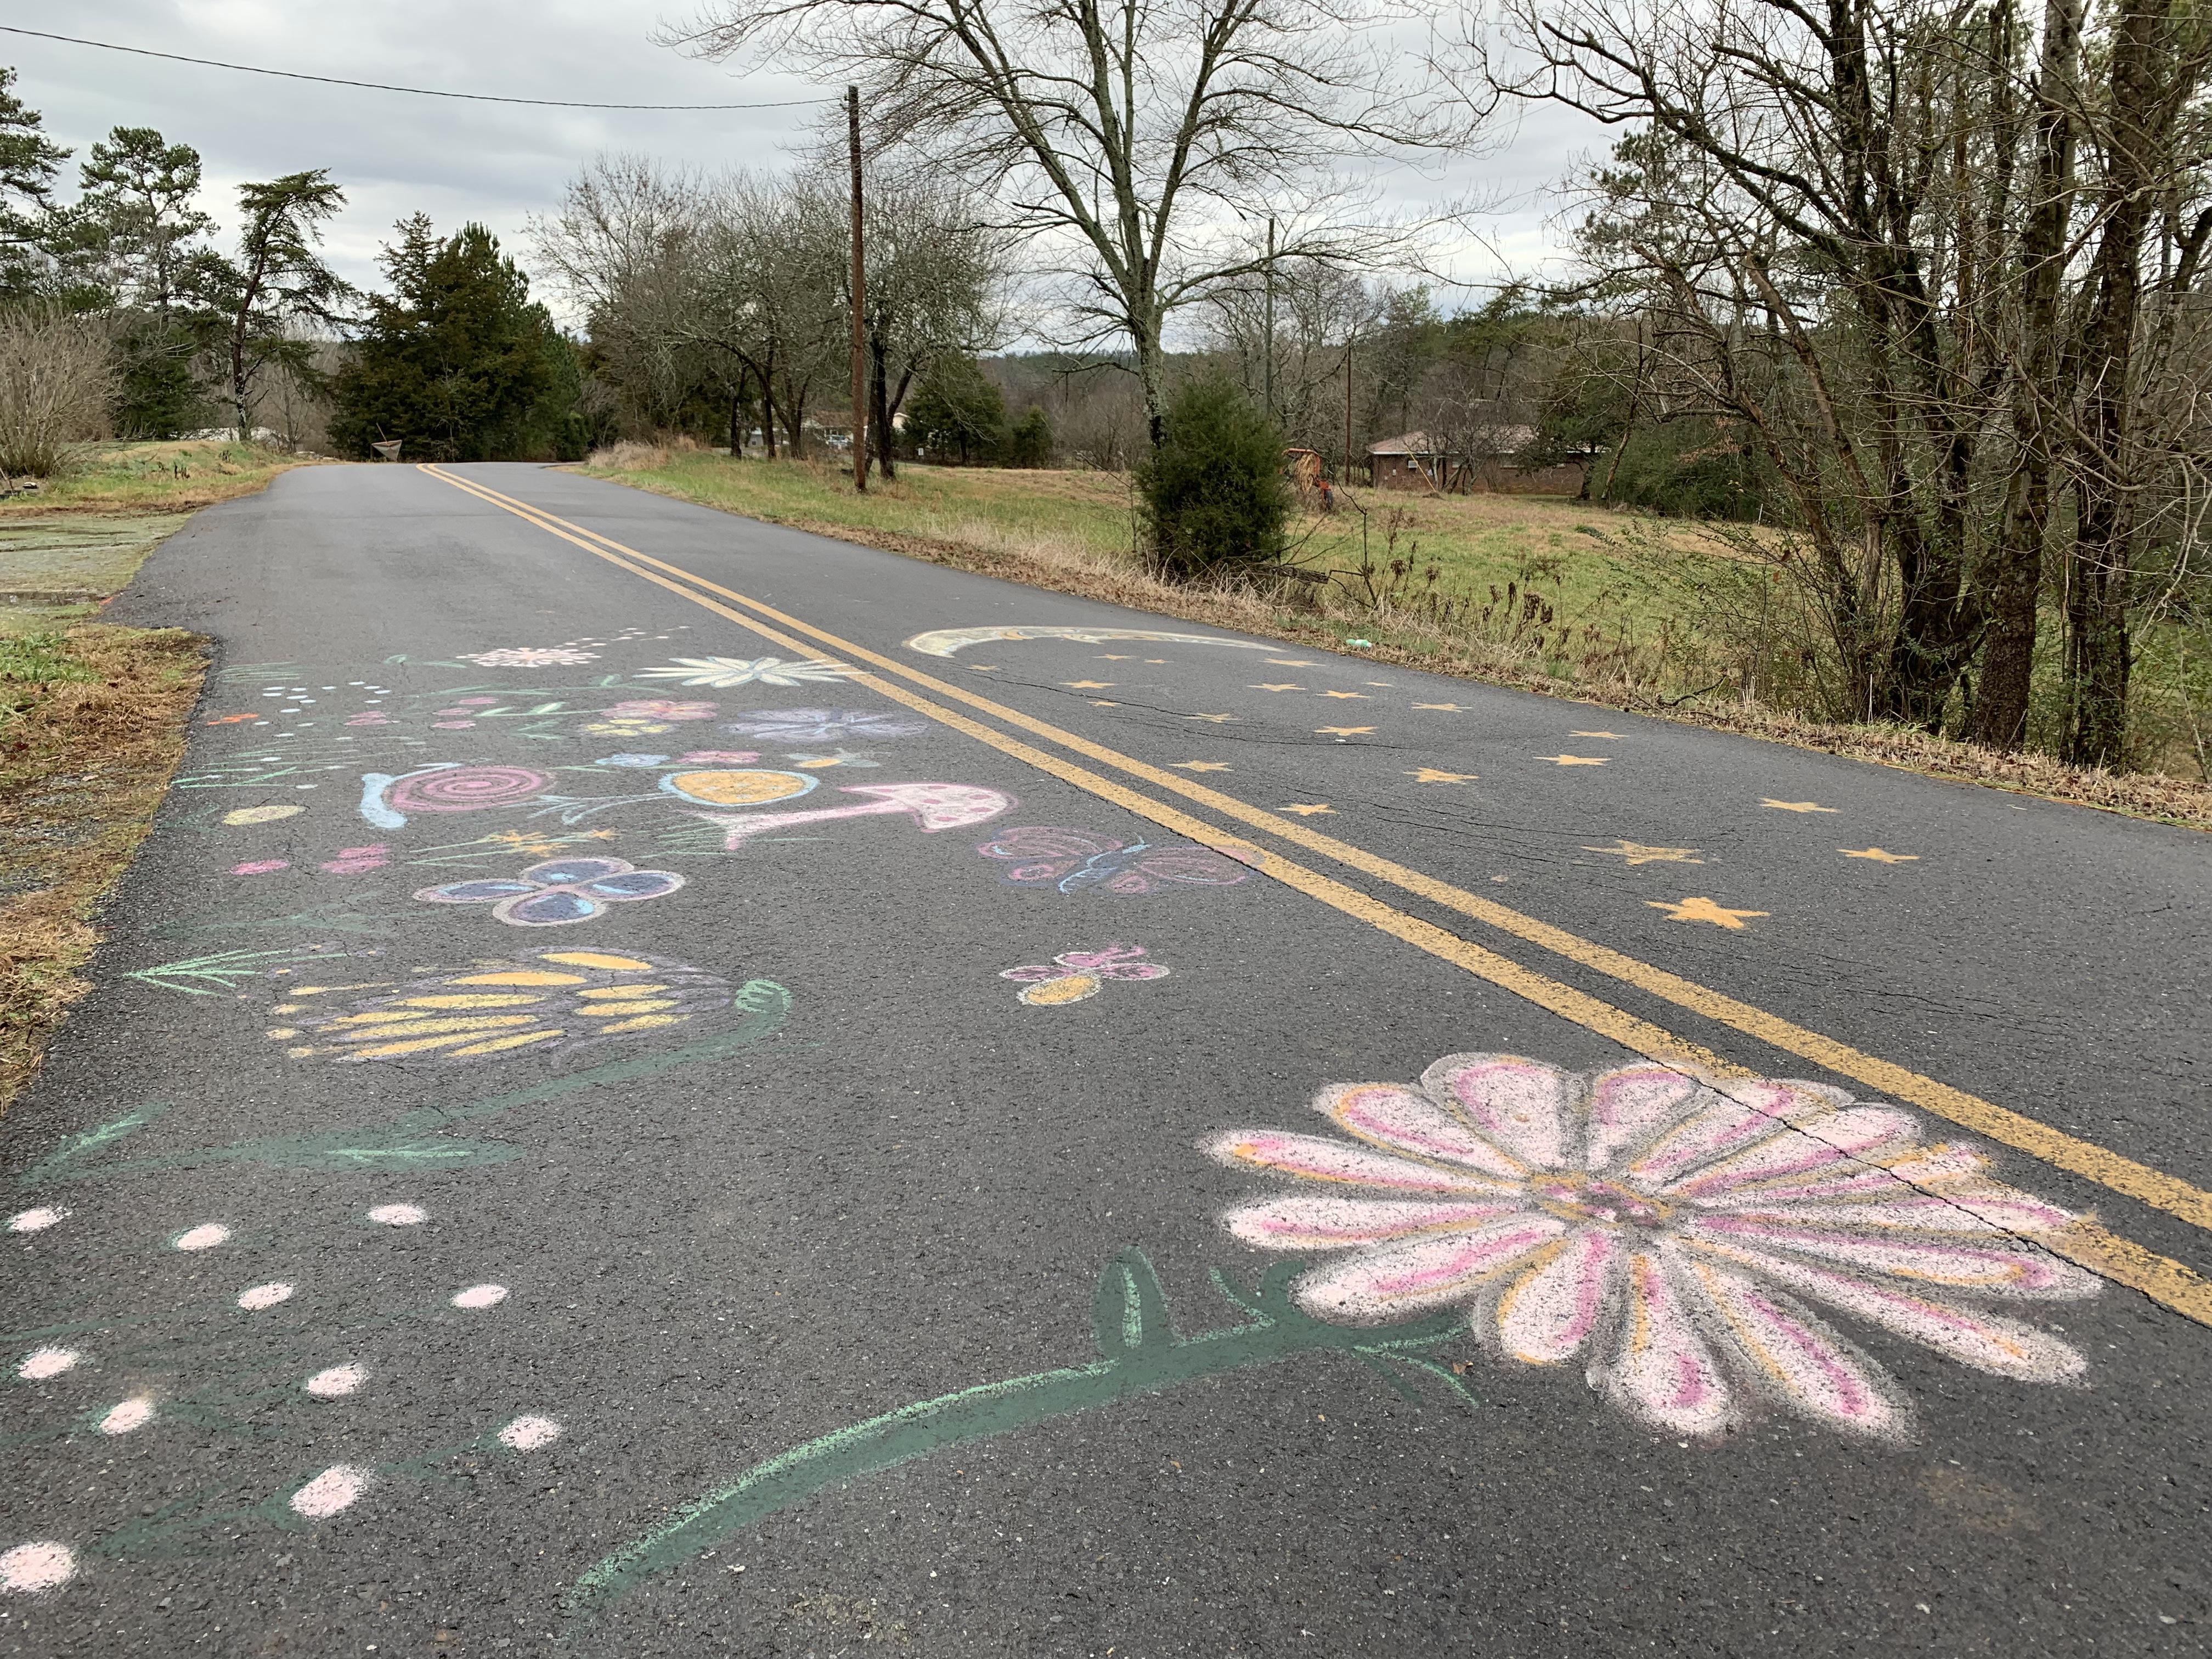 Road Art on the Loves Bridge route